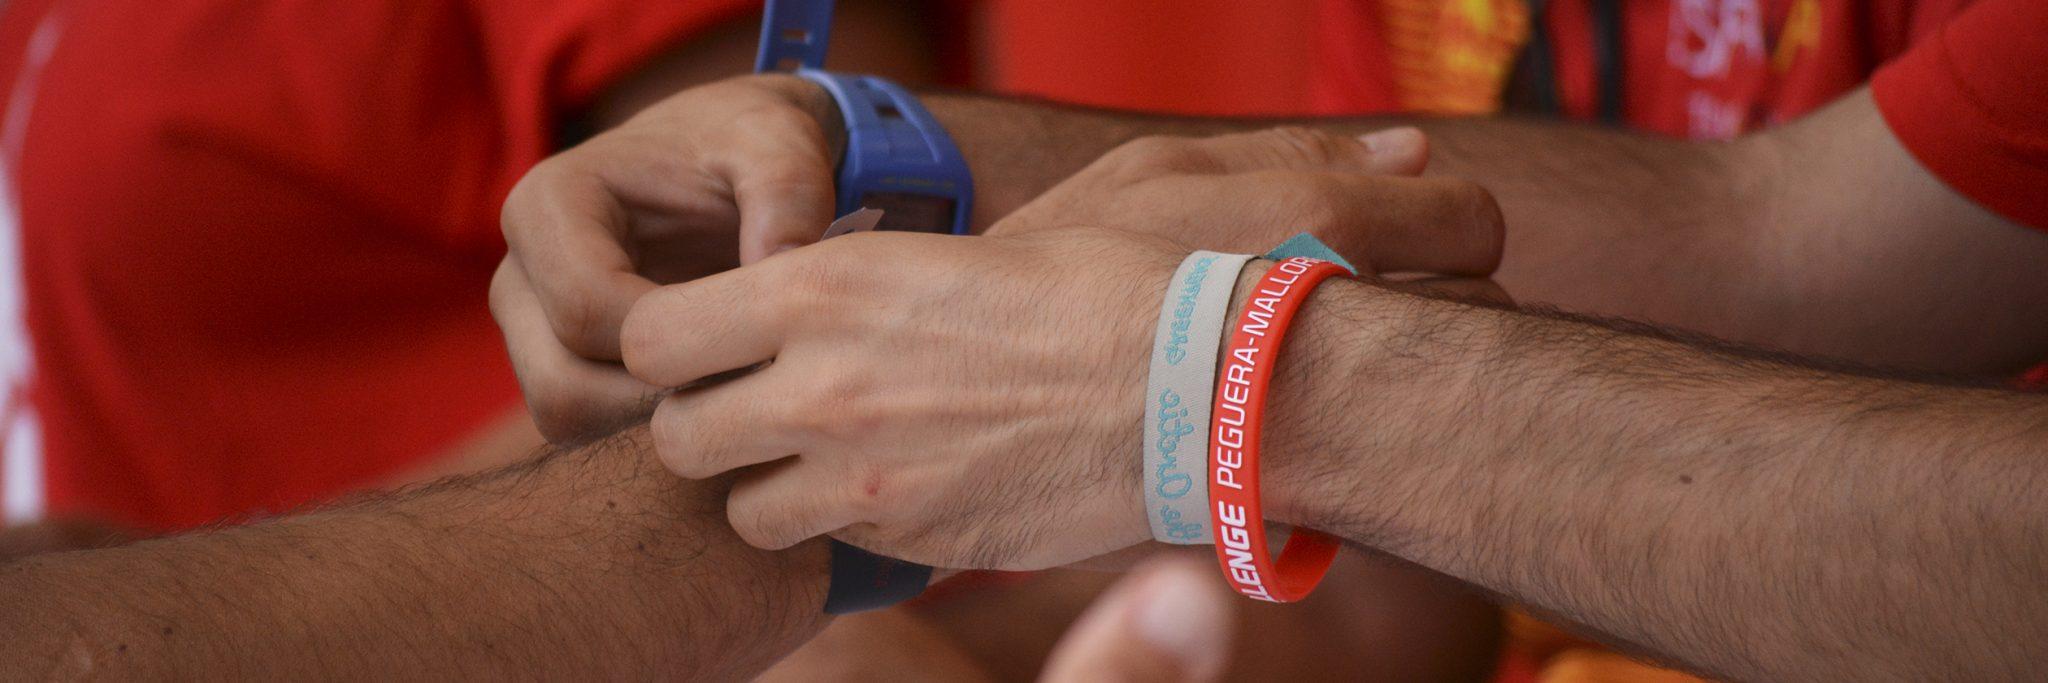 Challenge Peguera Mallorca hand bracelet registration